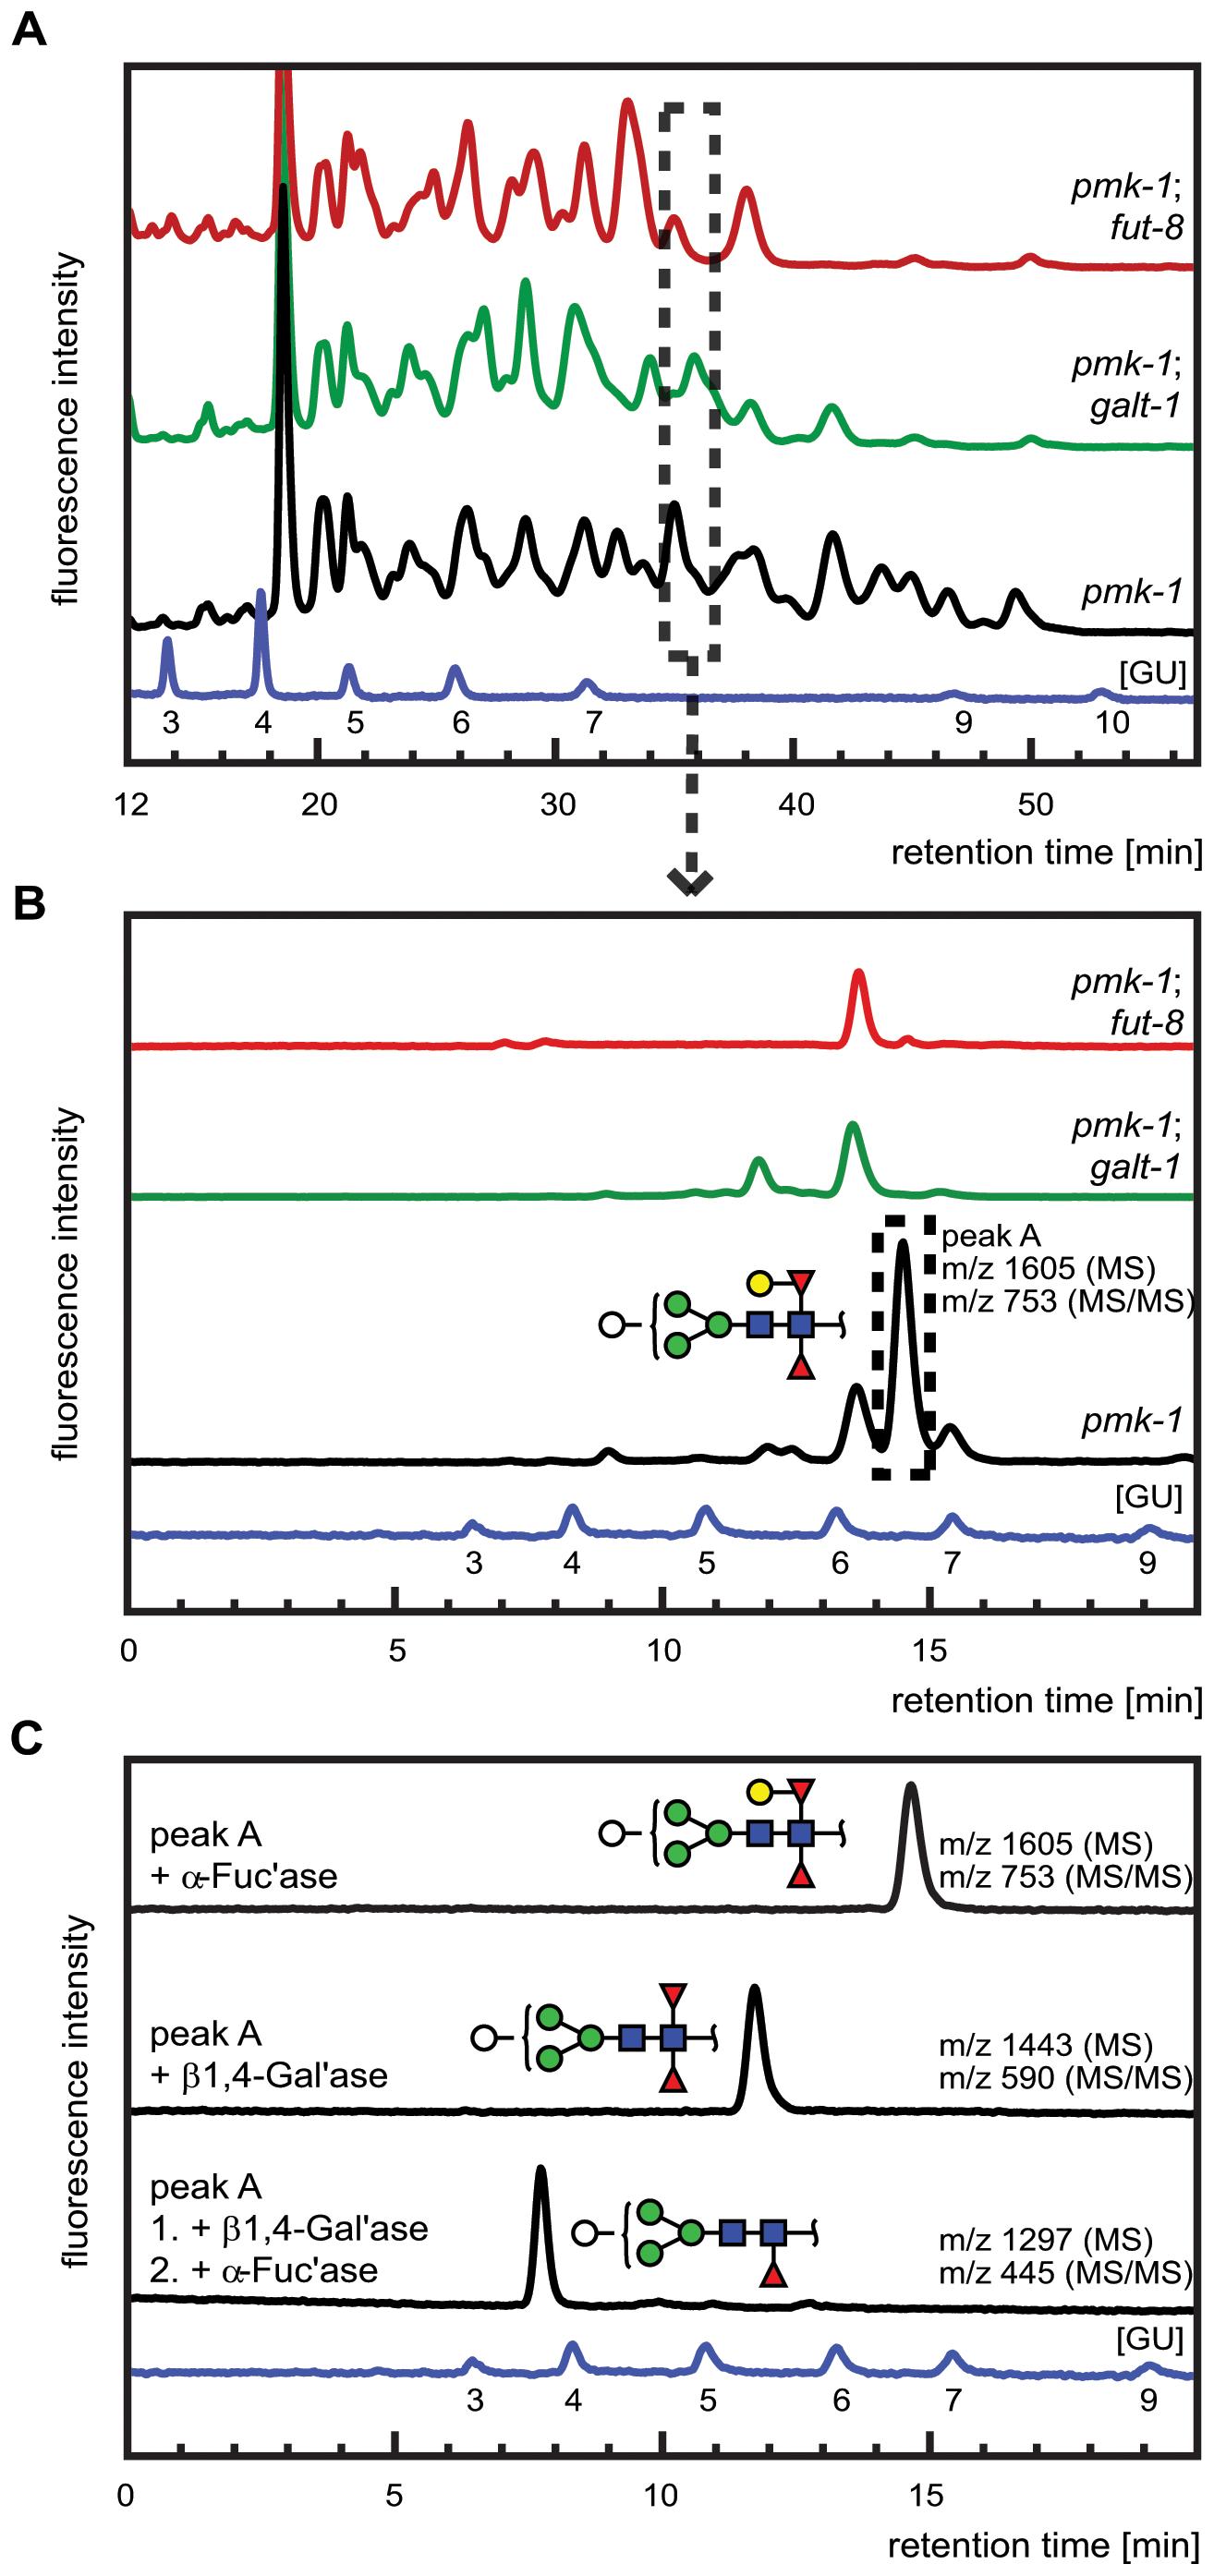 Comparative analysis of the N-glycome in CGL2-resistant <i>C. elegans</i> double mutants <i>pmk-1;fut-8(op498)</i> (red trace) and <i>pmk-1(km25);M03F8.4(op497)</i> (green trace) and the isogenic CGL2-hypersensitive single mutant strain <i>pmk-1(km25)</i> (black trace).